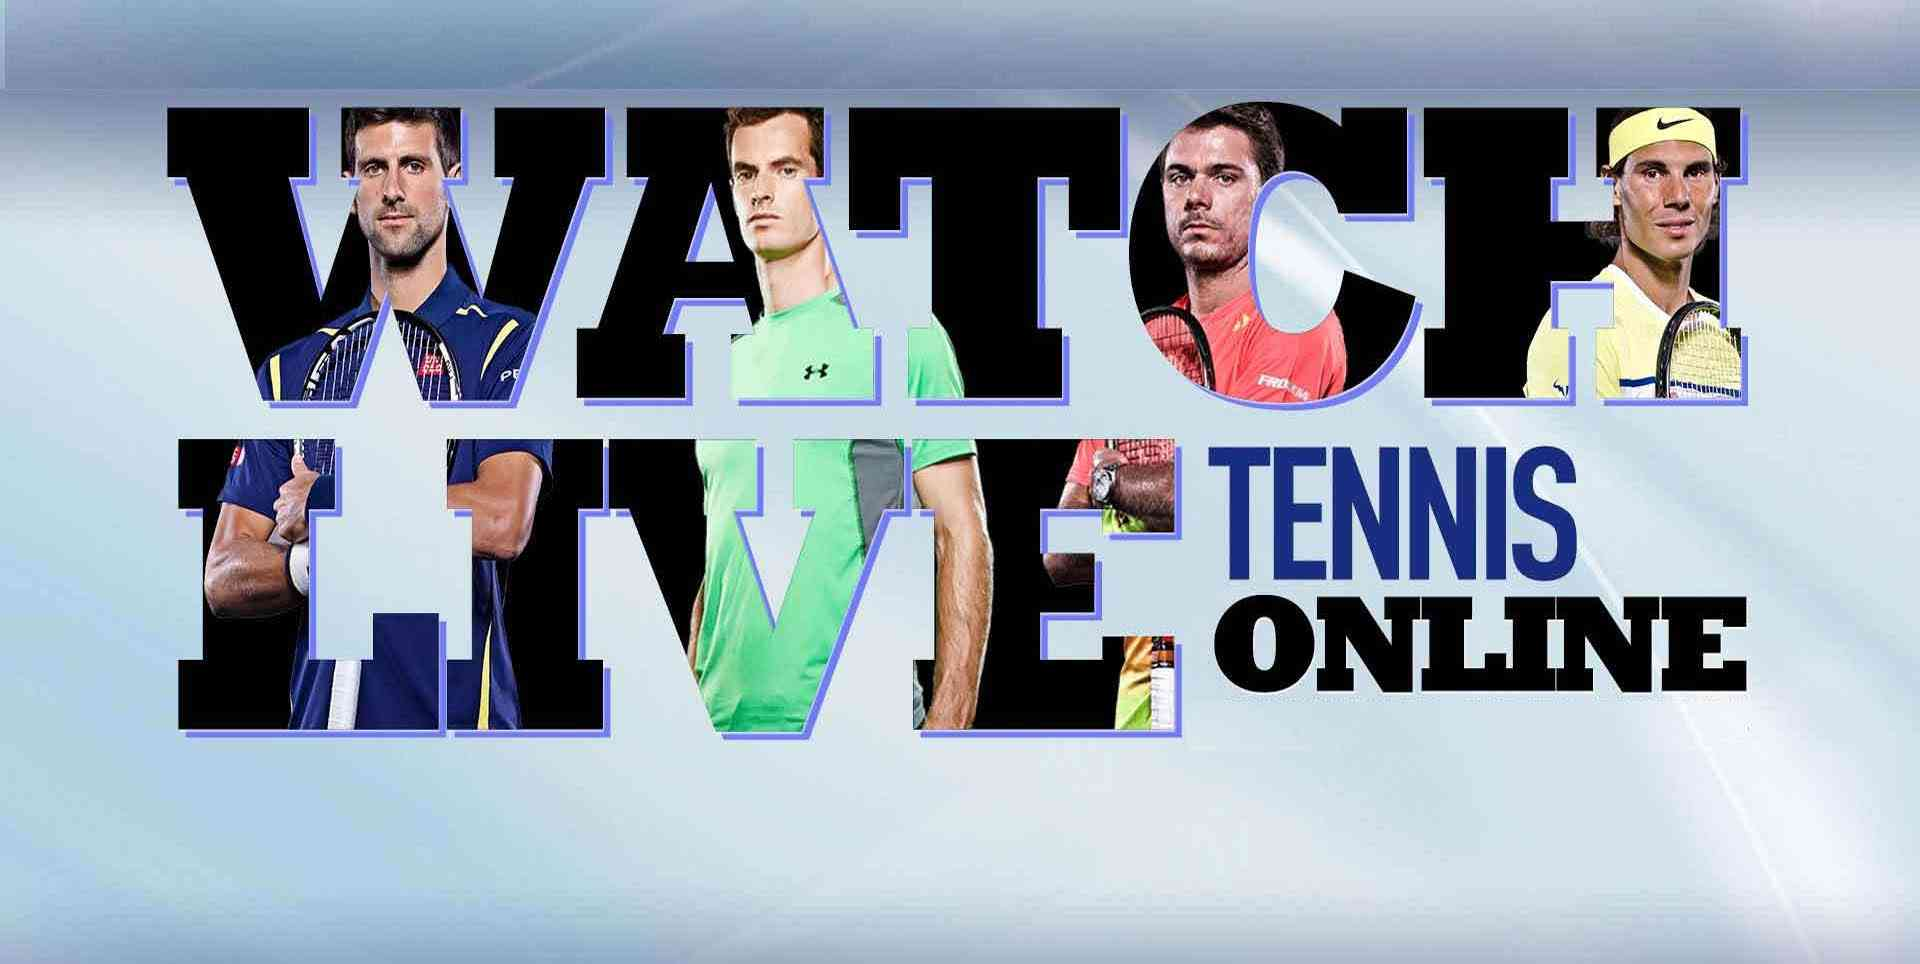 Watch Semi final M. Granollers | M. Lopez vs M. Draganja | F. Mergea live